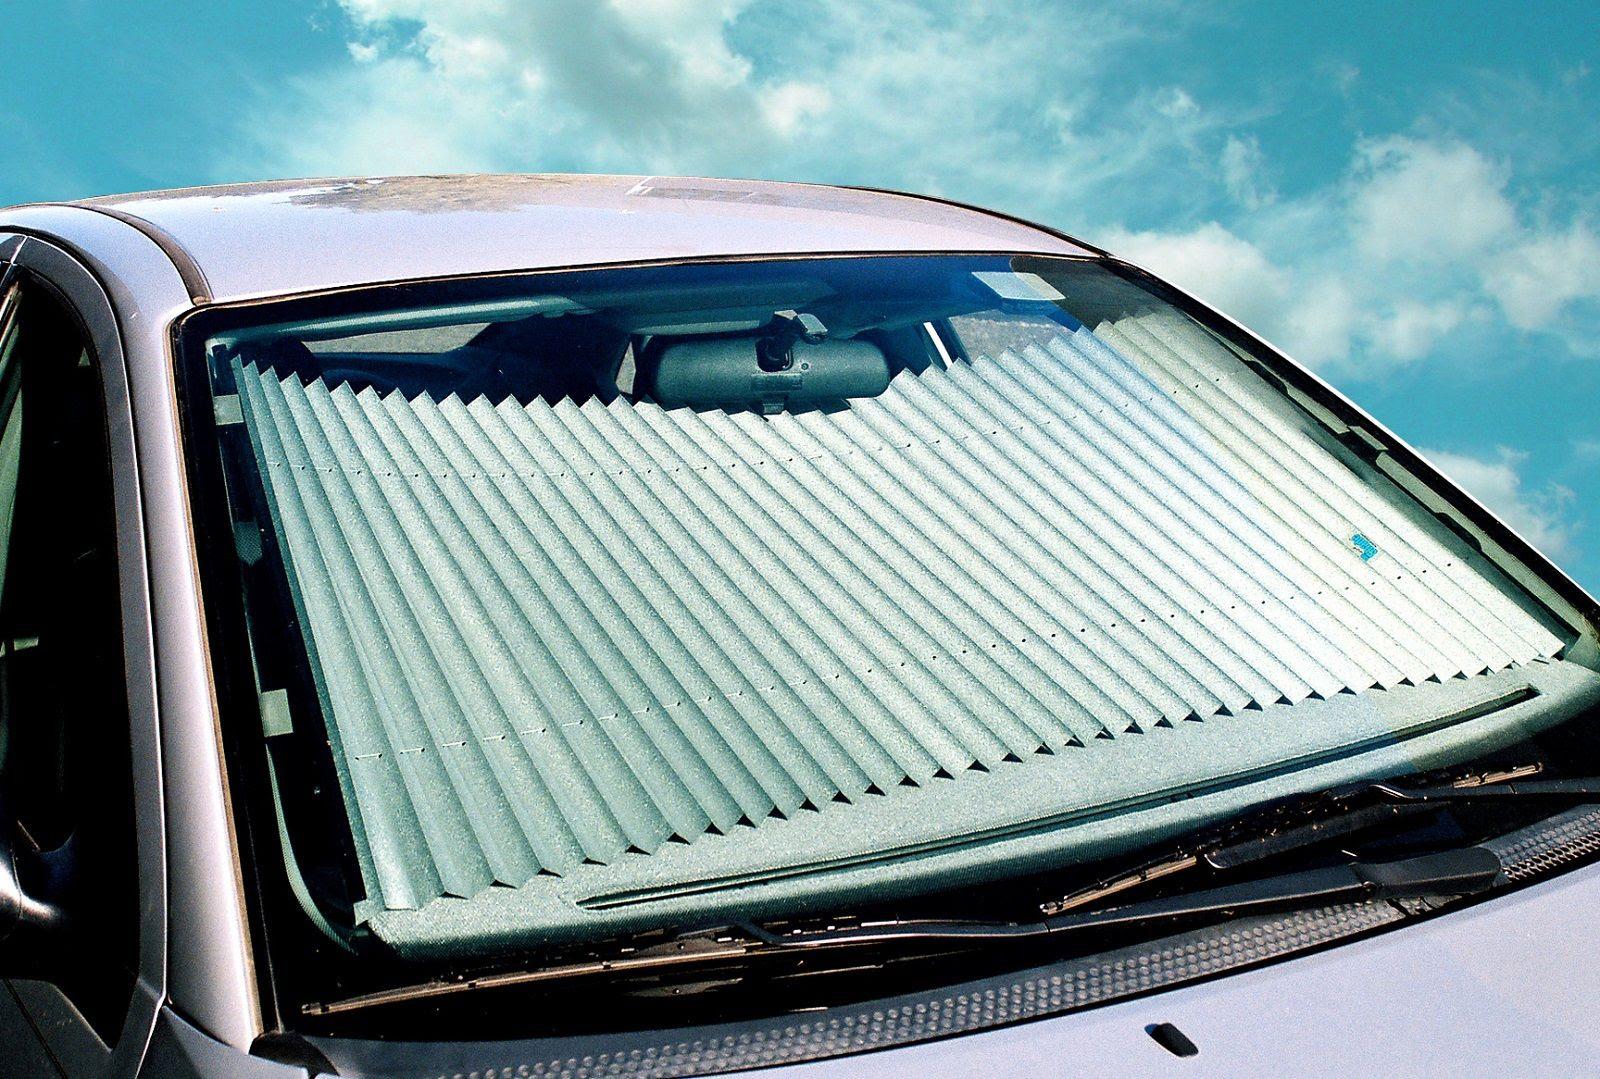 The Shade Retractable Windshield Sunshade Fits 2010-2013 KIA SOUL